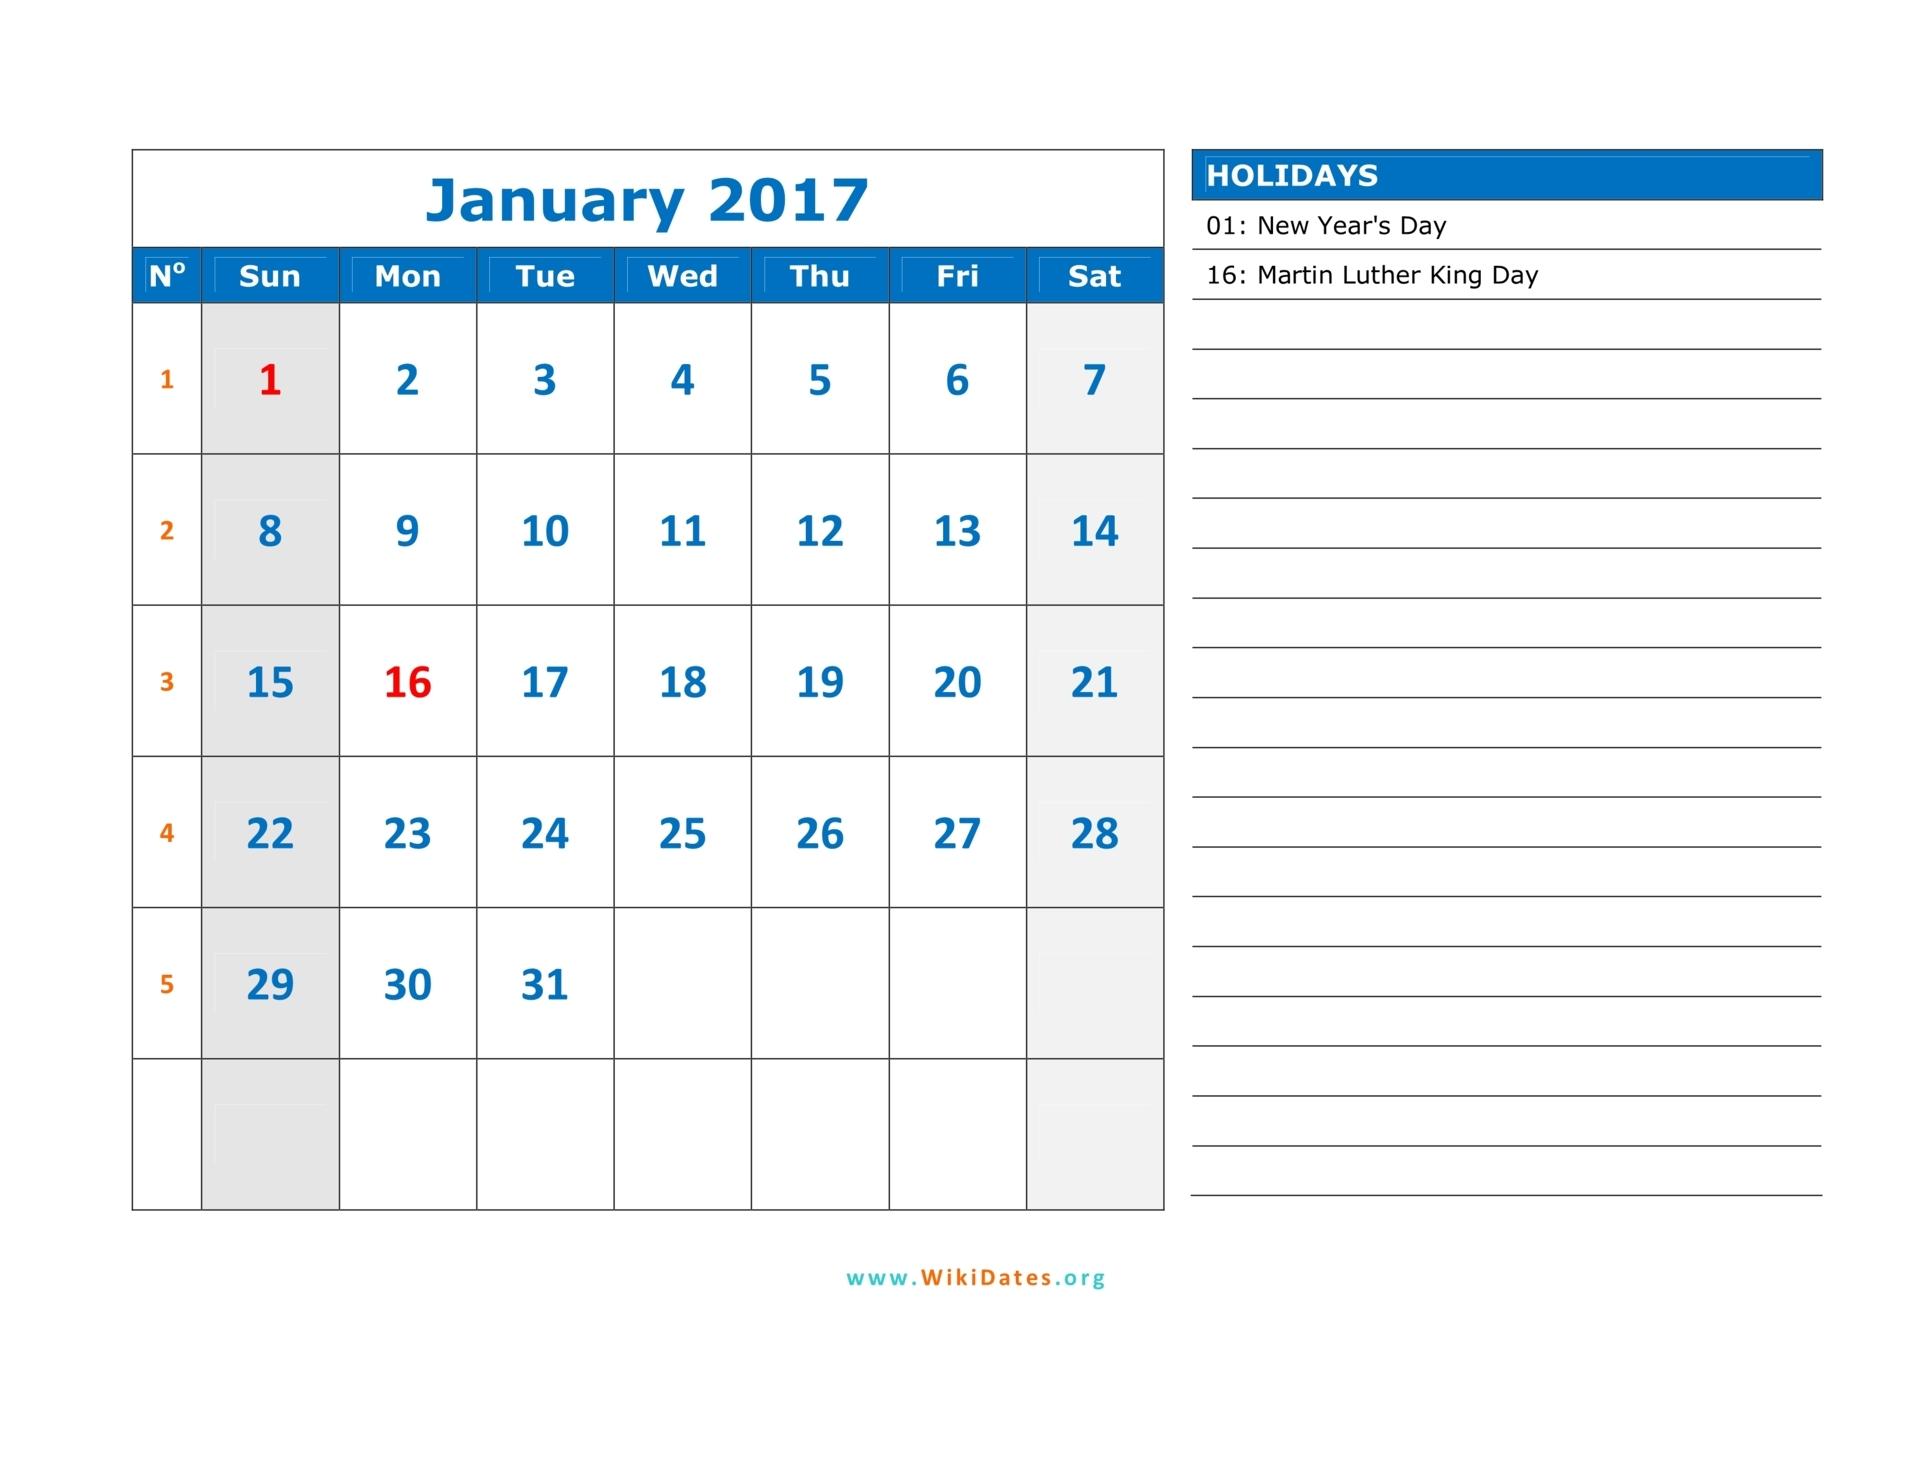 June 2016 calendar clipart banner free stock 2017 Calendar Clipart banner free stock